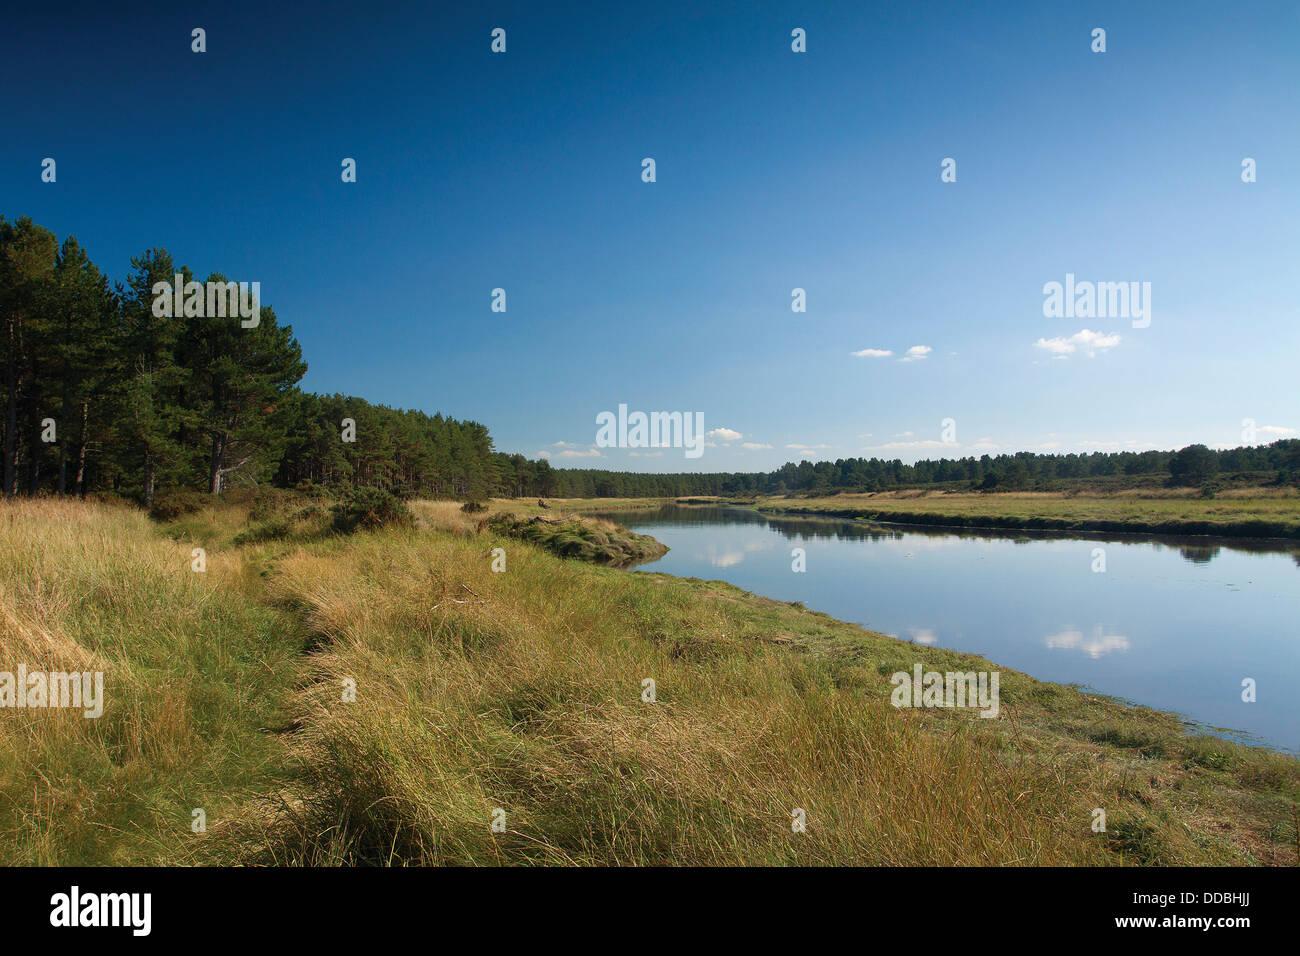 The River Lossie, Lossiemouth, Moray - Stock Image